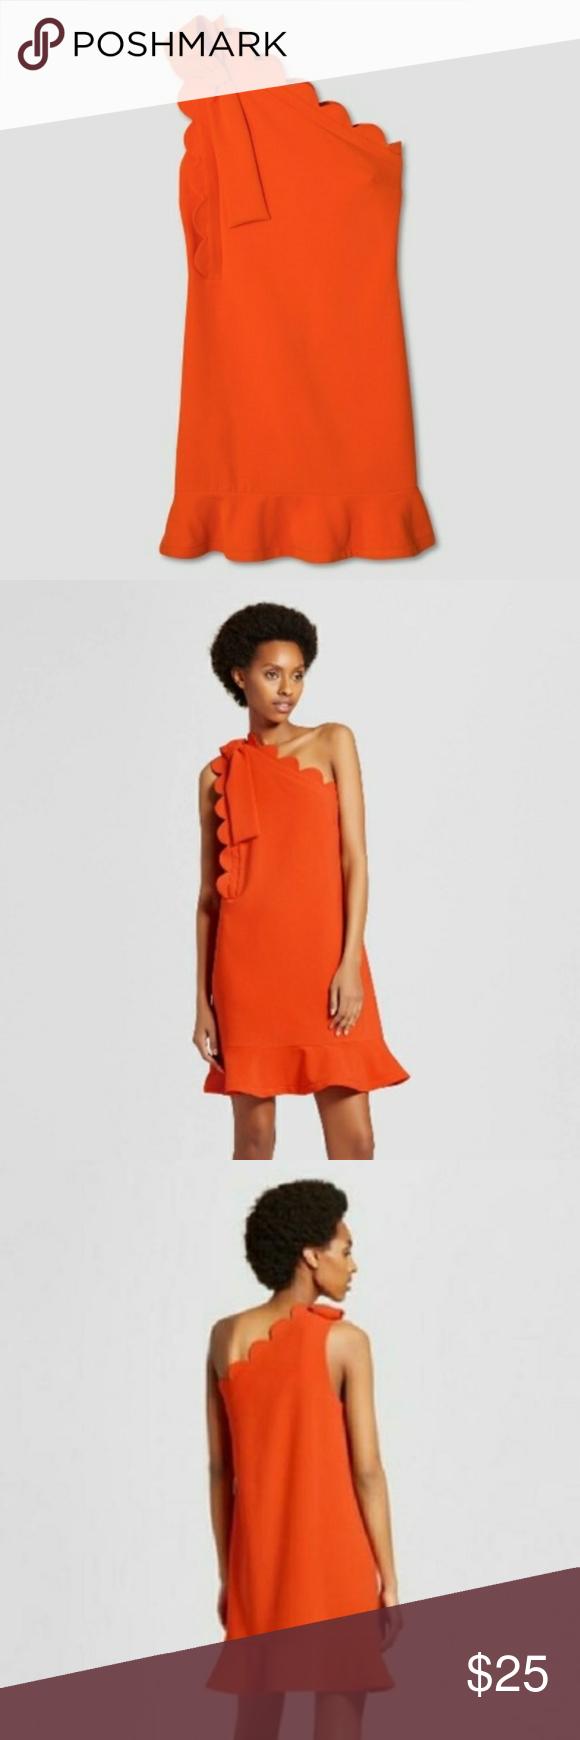 Orange Scalloped Detail Victoria Beckham Dress Victoria Beckham Dress Dresses Target Dresses [ 1740 x 580 Pixel ]